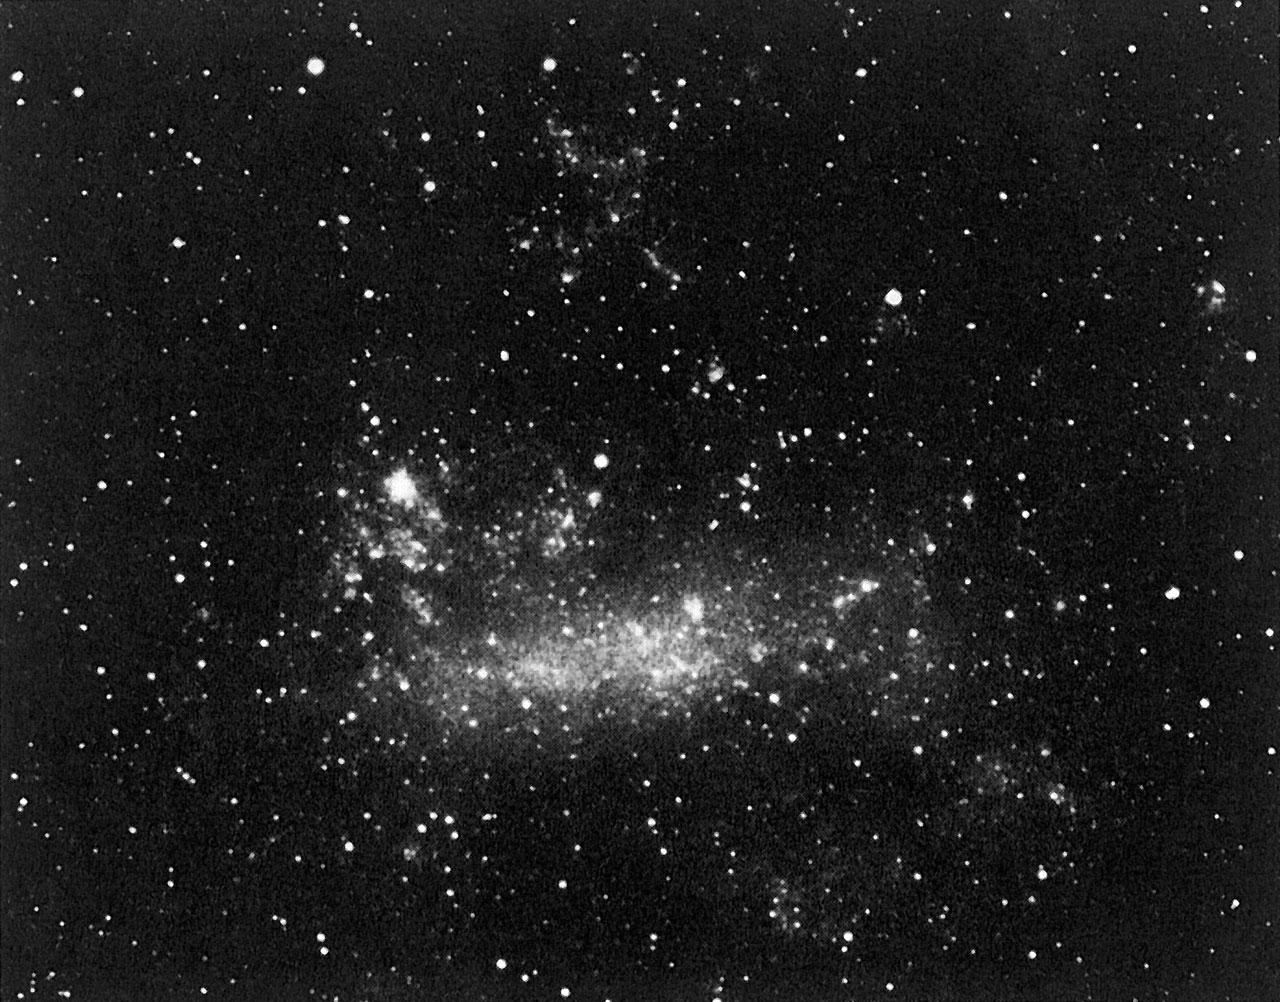 Last colour photo before the supernova explosion in LMC